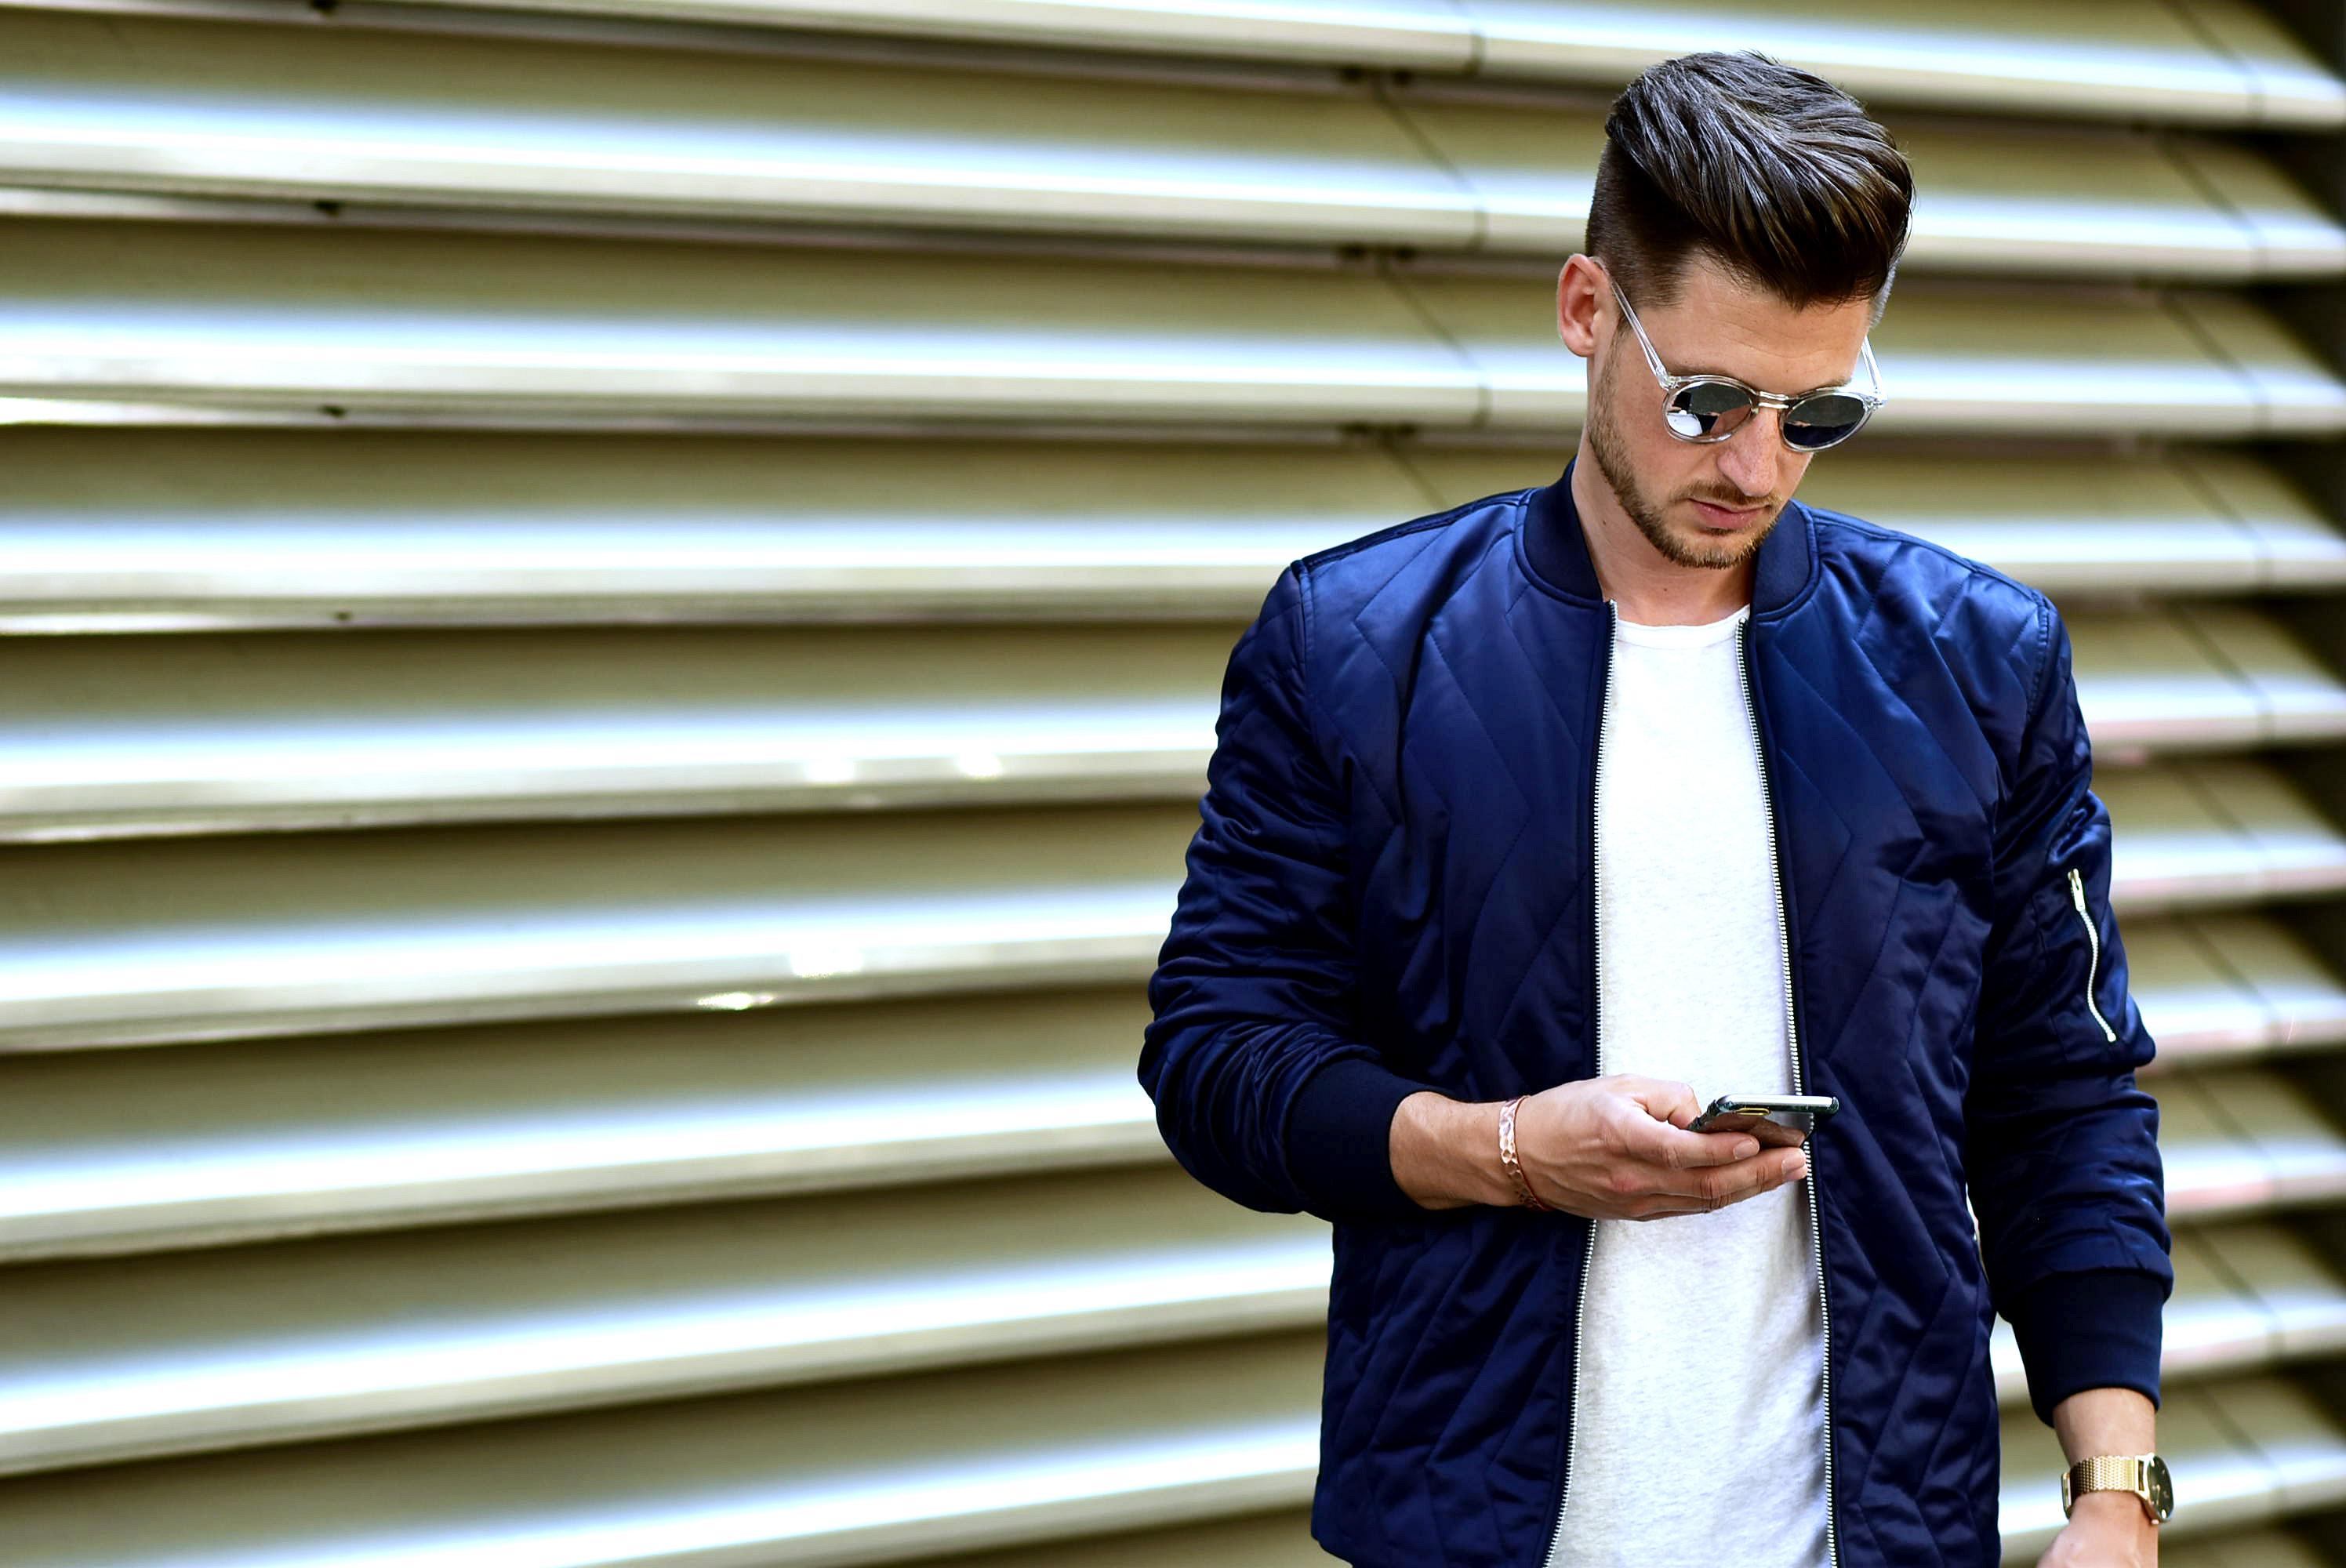 Tommeezjerry-Styleblog-Männerblog-Modeblog-Berlin-Berlinblog-Outfit-Streetlook-Zickzack-Seidigebomberjacke-Bomberjacke-Skinny-Jeans-Adidas-Superstar-Weißes-Shirt-Sonnenbrille-Close-Up